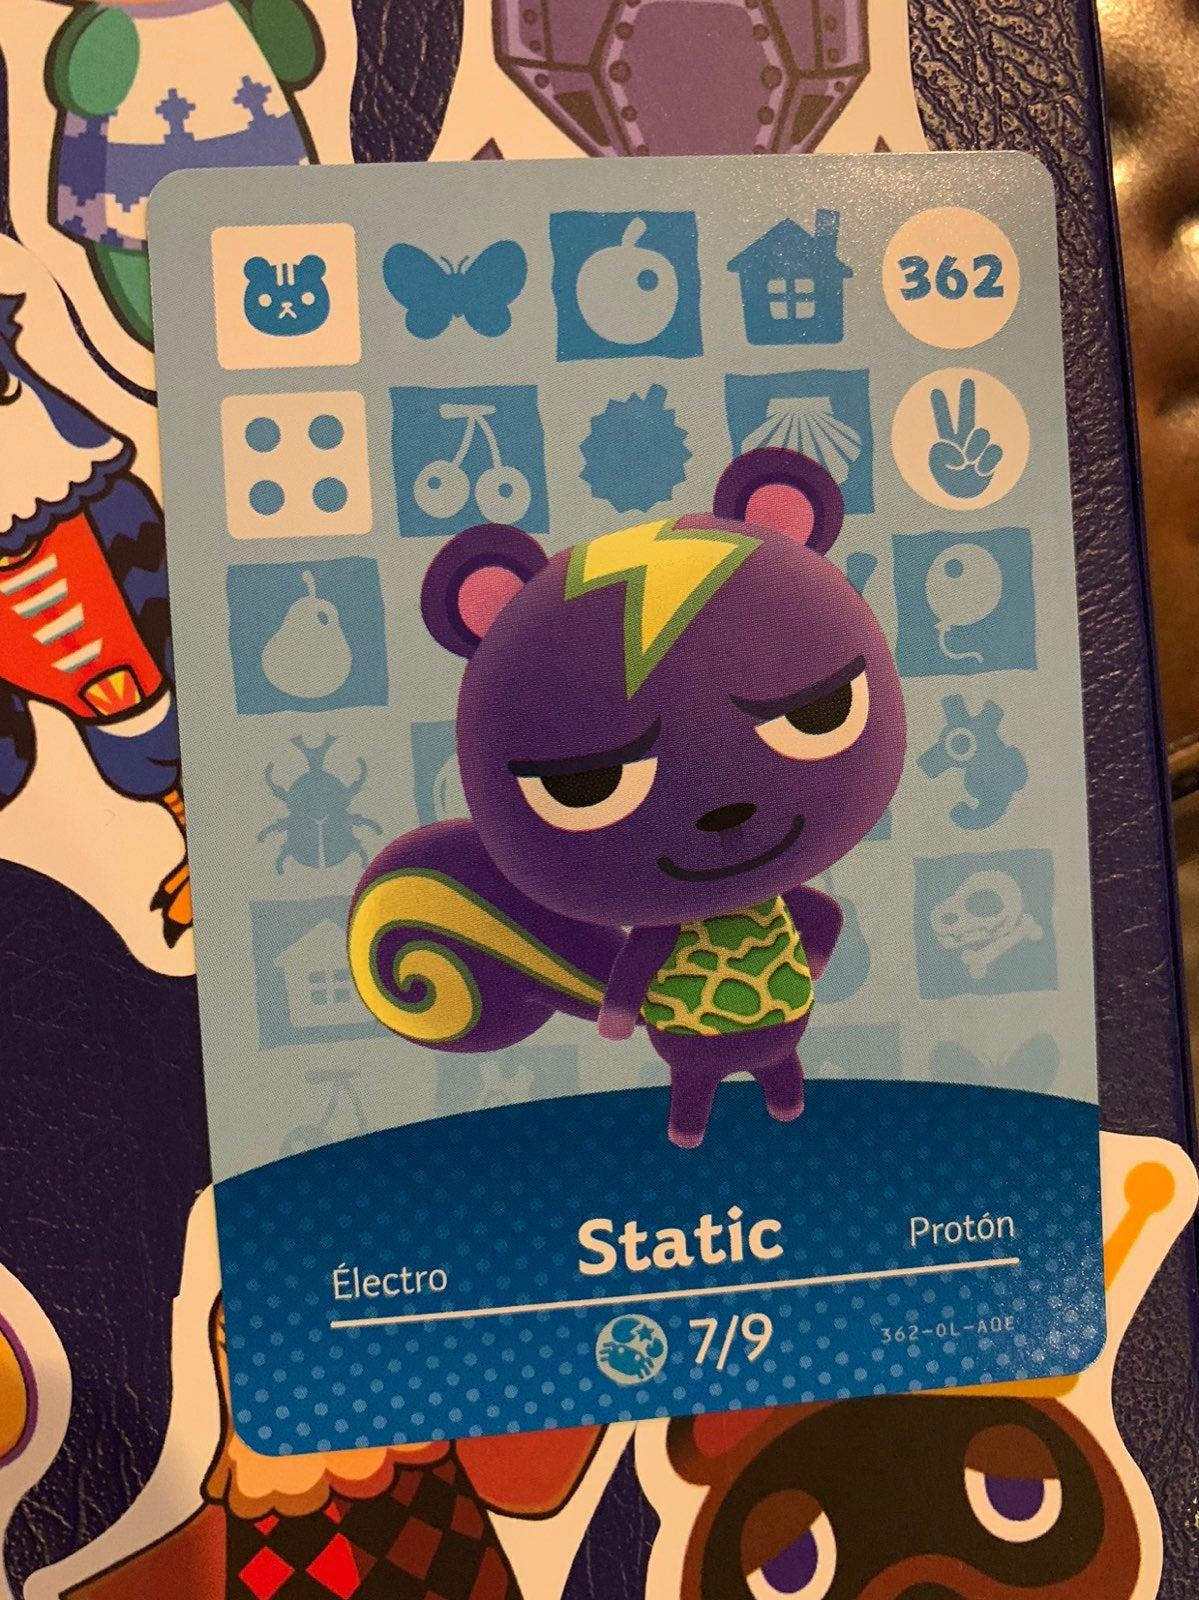 Static Animal Crossing Amiibo Card